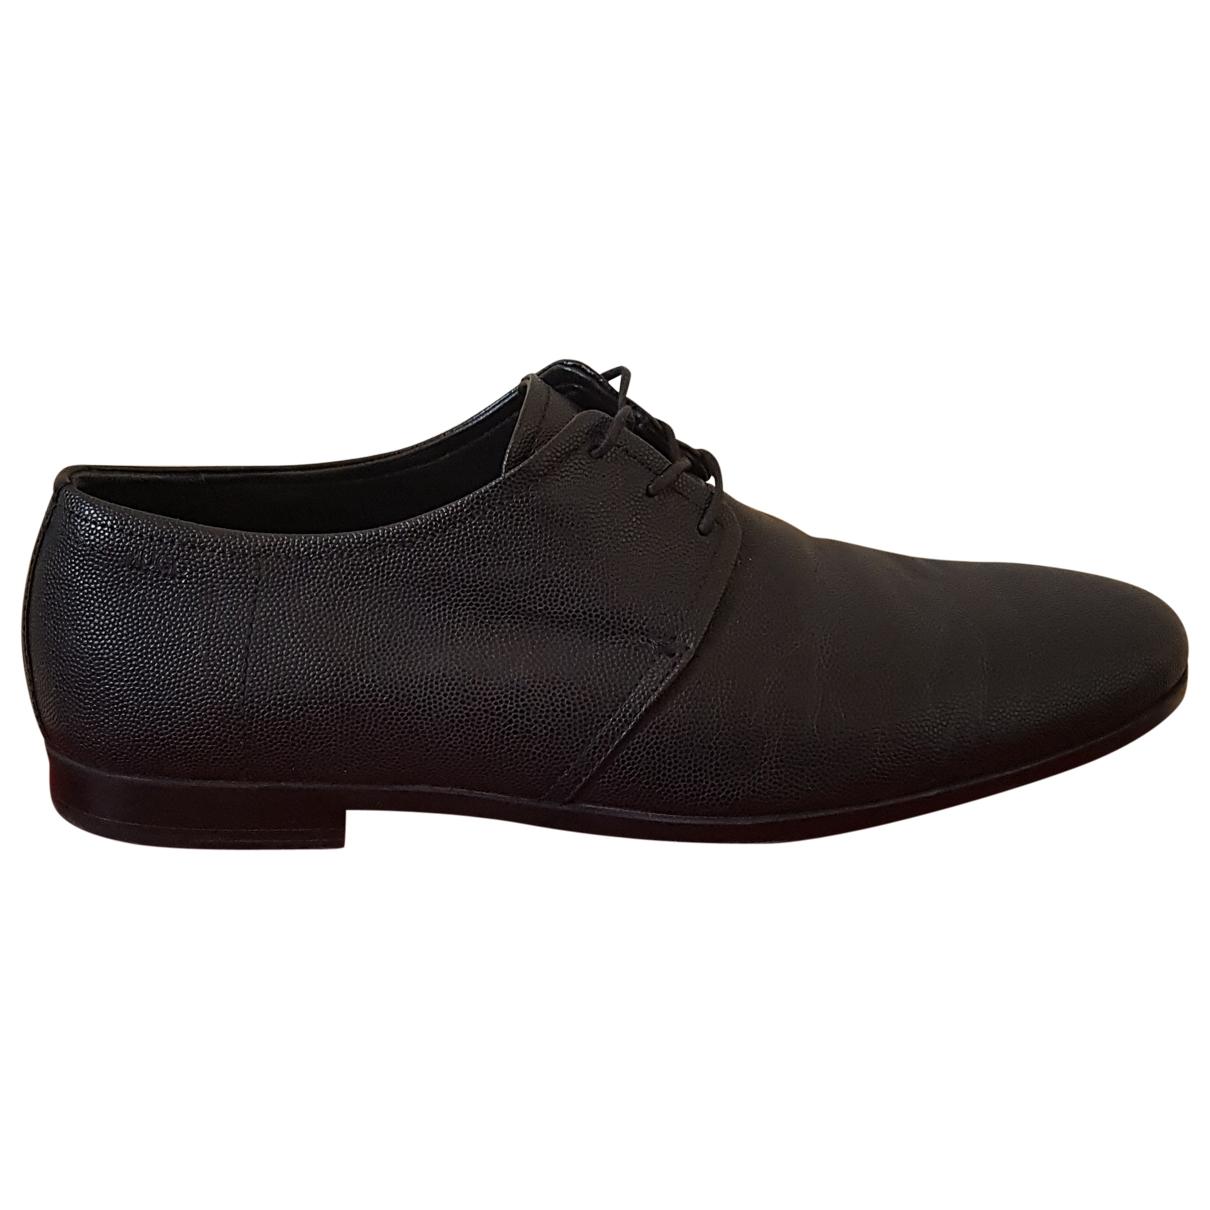 Hugo Boss \N Black Leather Lace ups for Men 42 EU